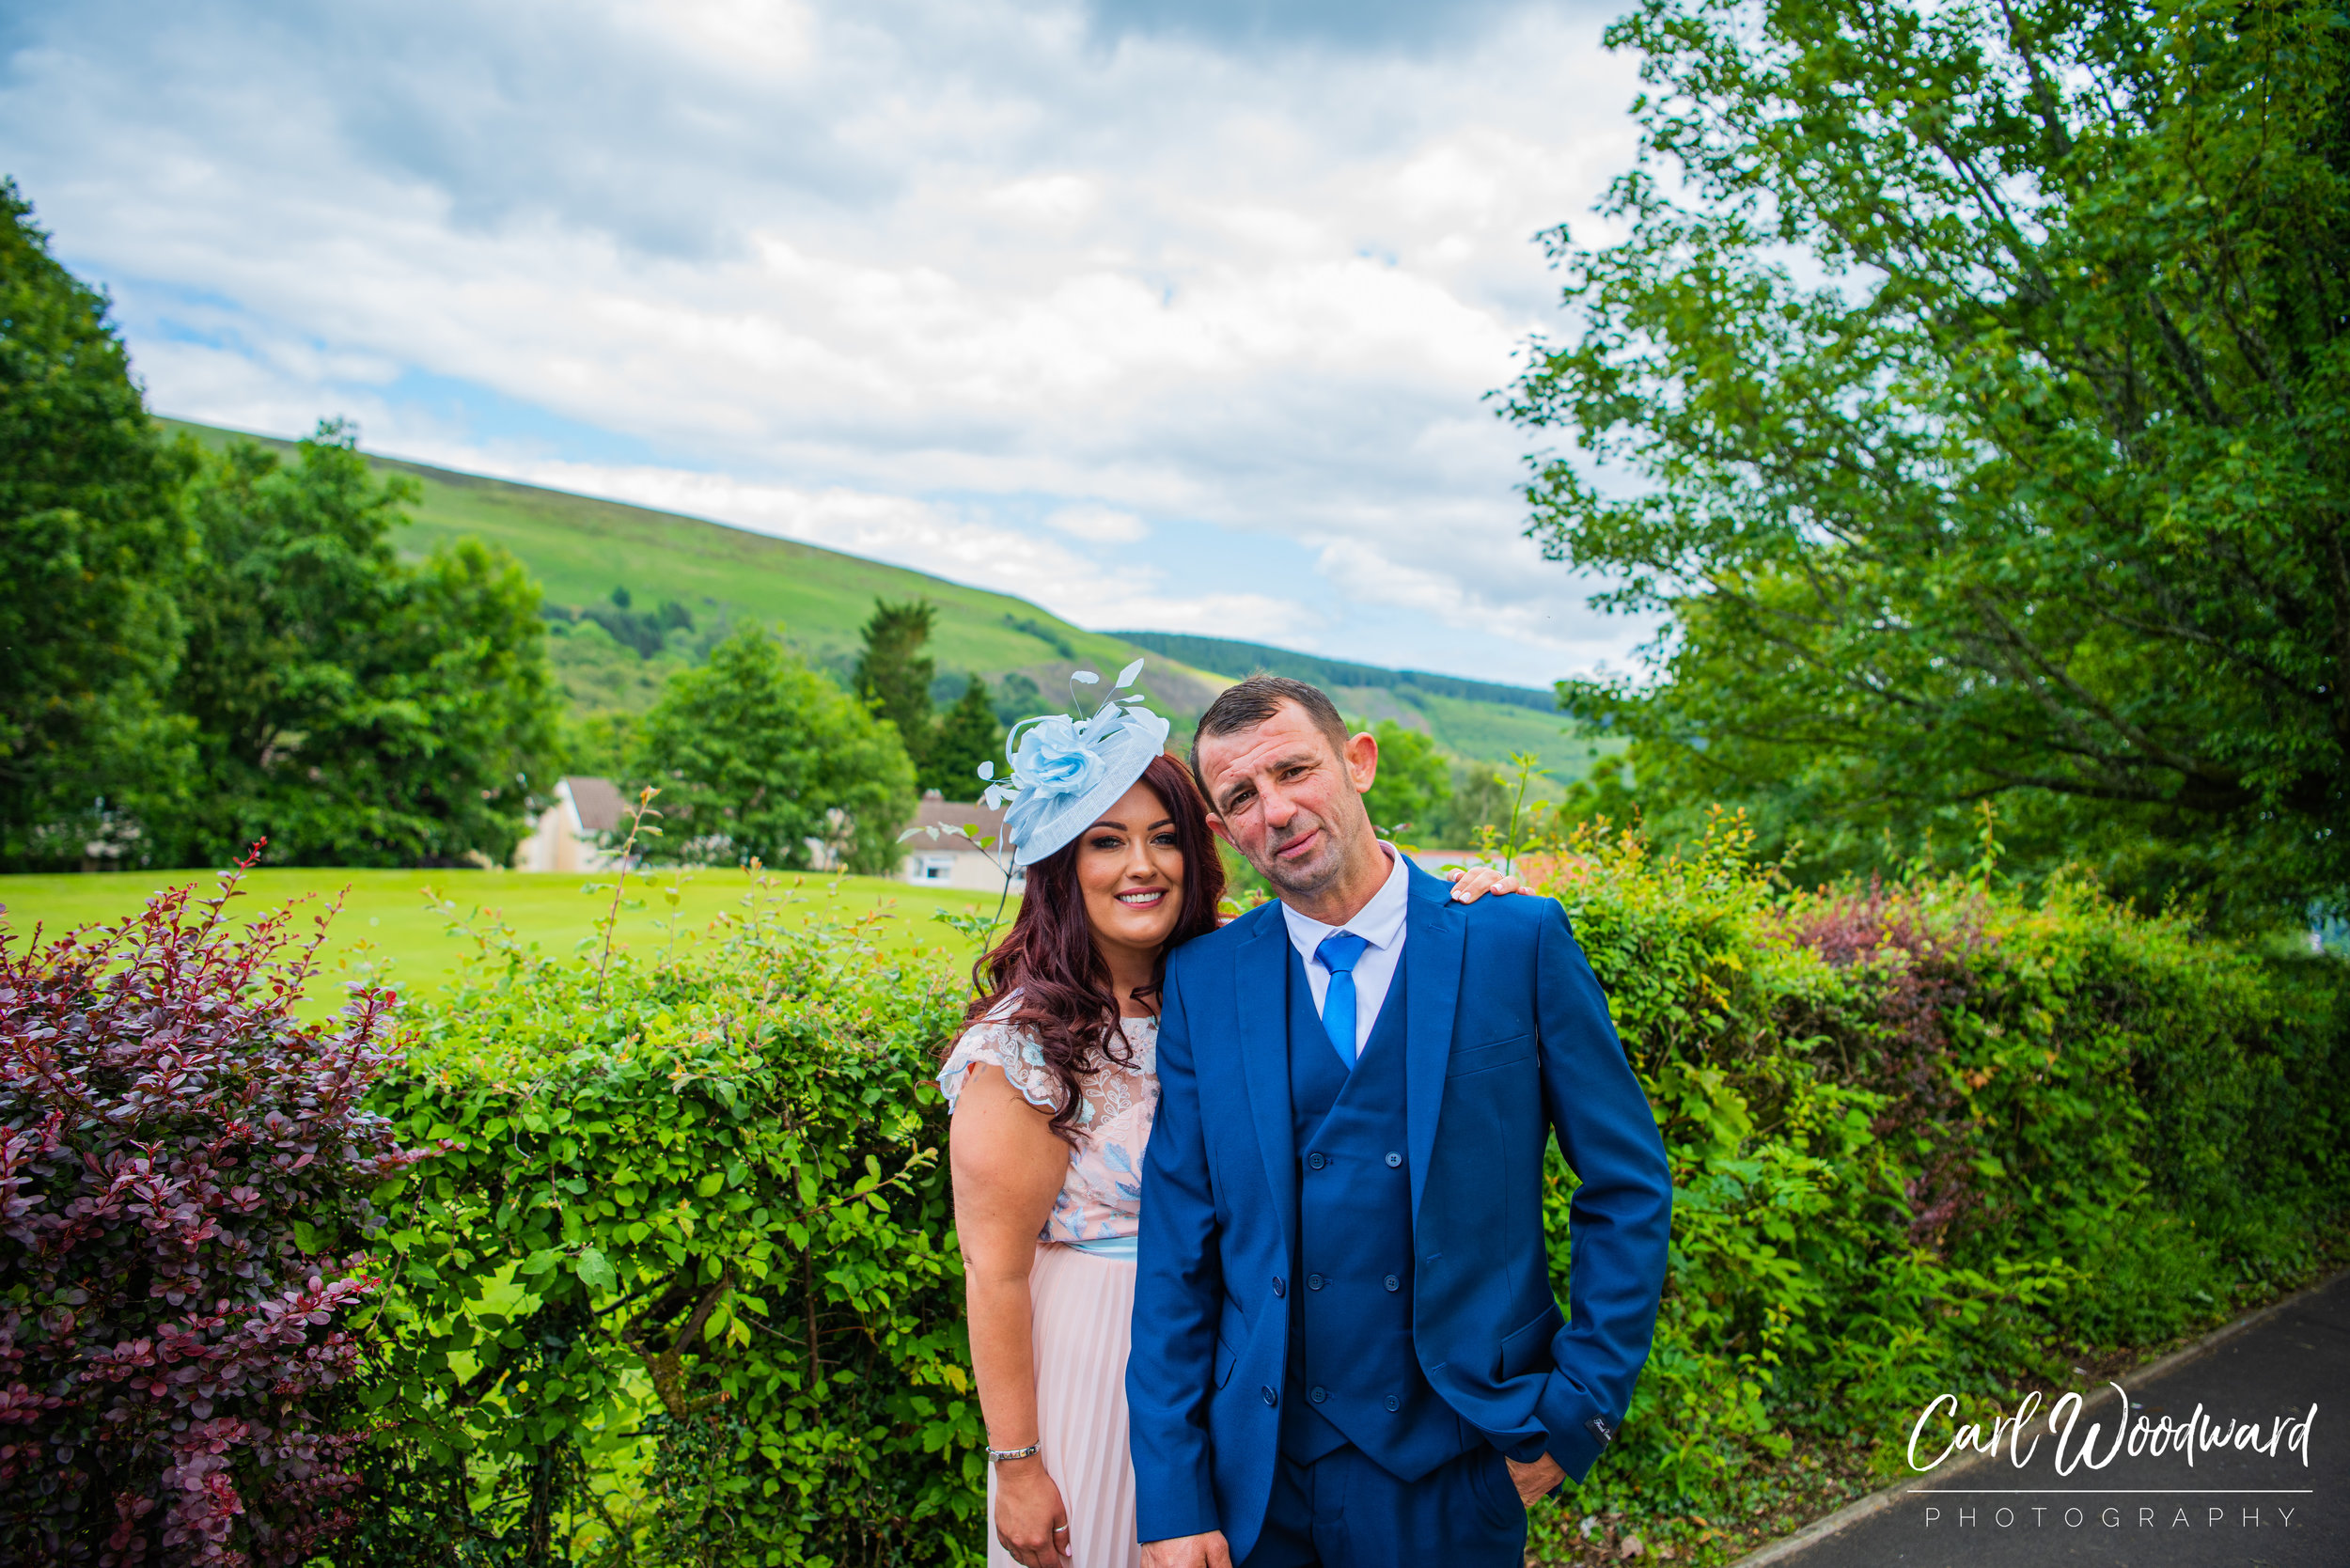 012-Mountain-Ash-Golf-Club-Wedding-Photography-Cardiff-Wedding-Photographer.jpg